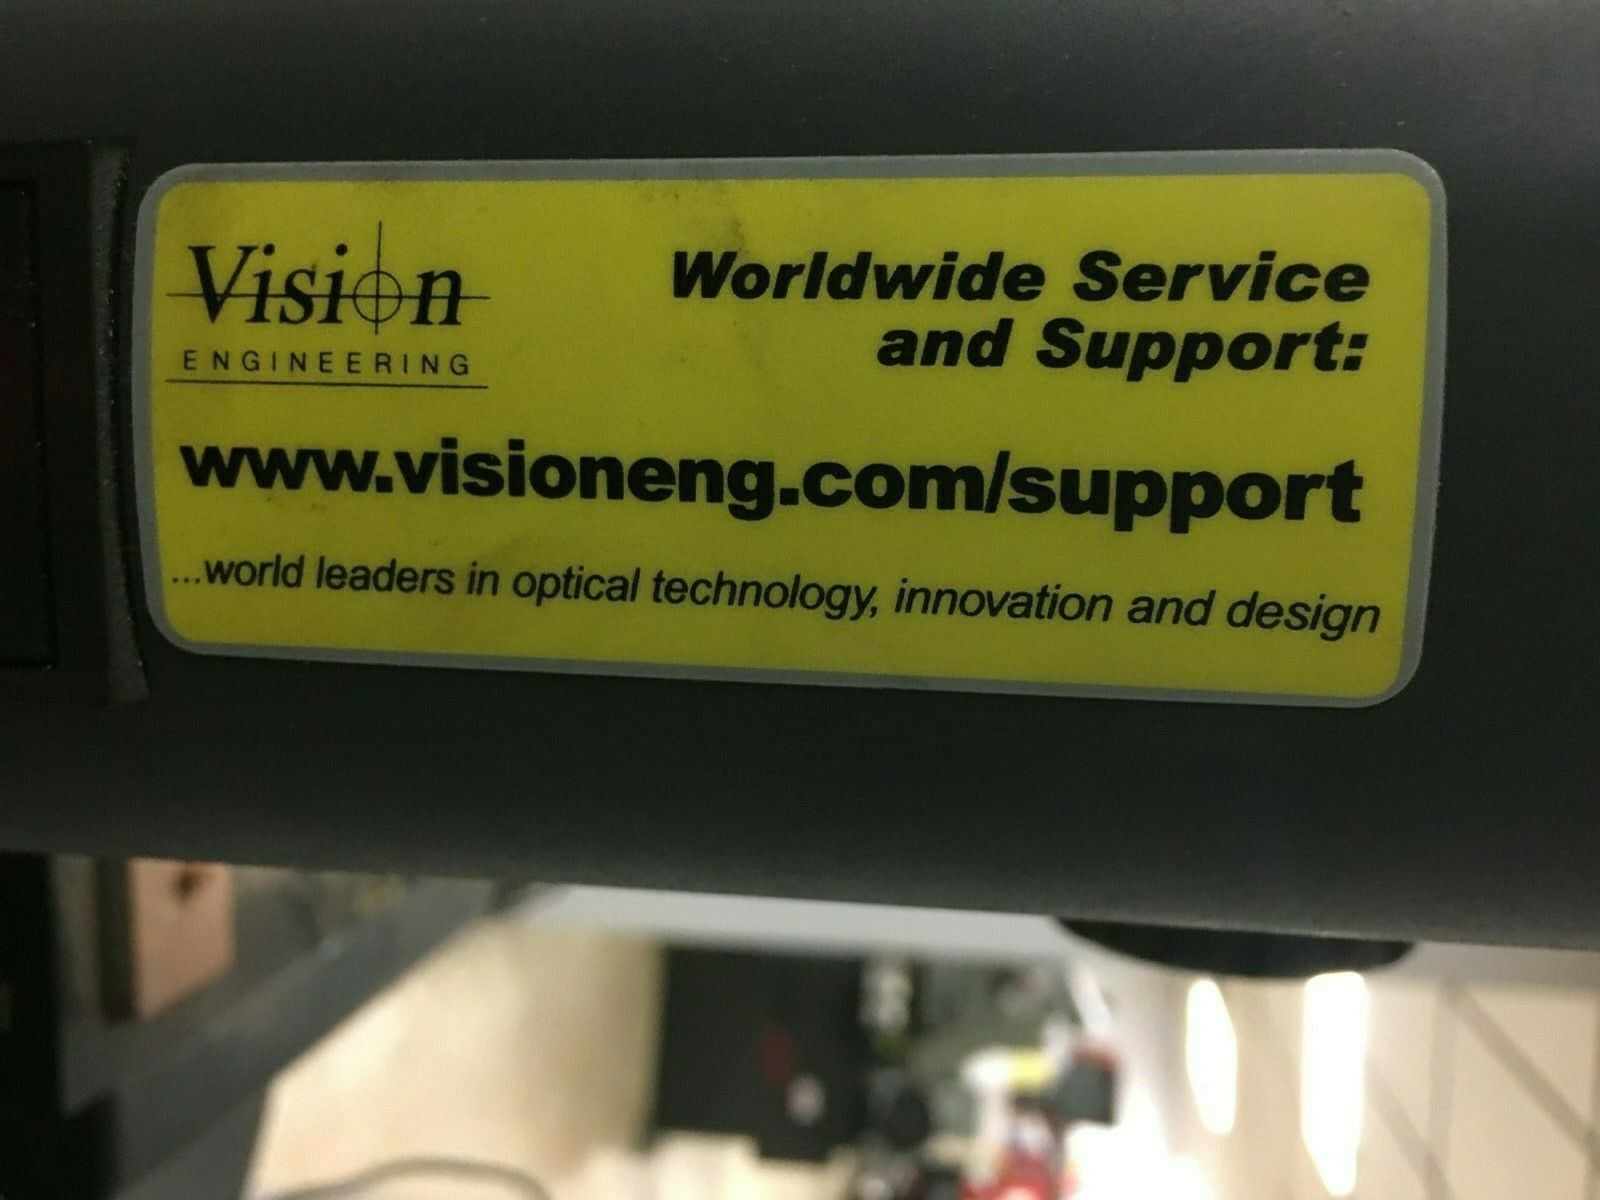 Vision Engineering Kestrel Dynascope Eyepiece-Less Measuring Microscope, S/N K11129.